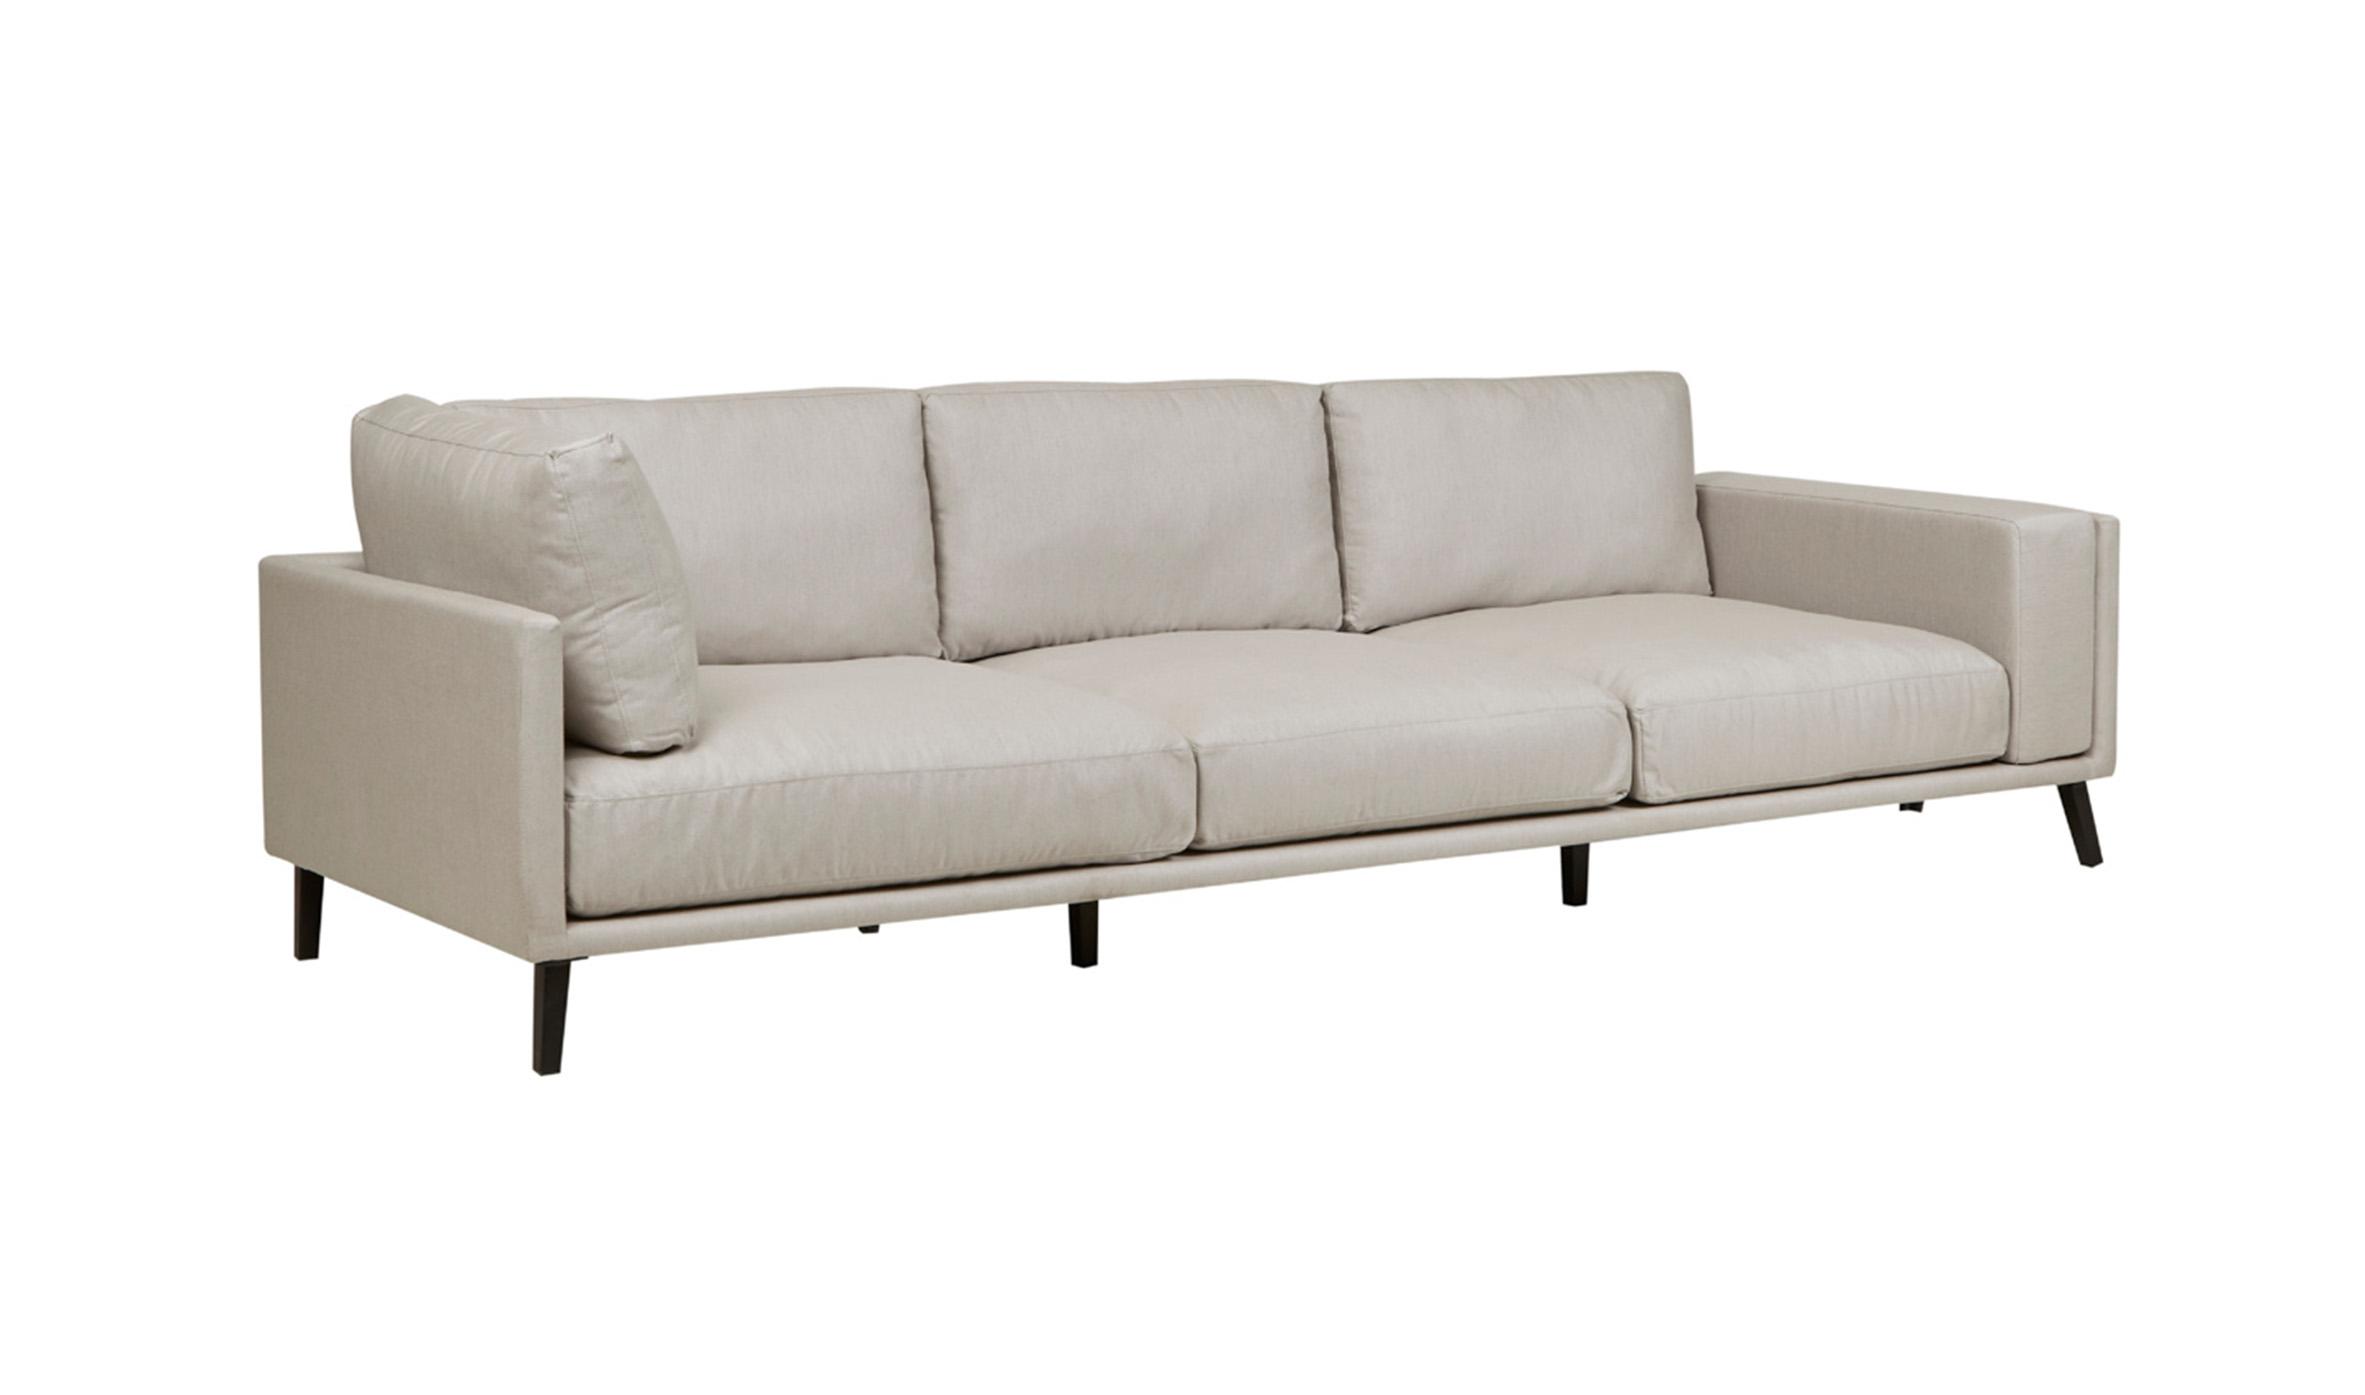 Furniture Thumbnails outdoor-sofas-aruba-square-right-chaise